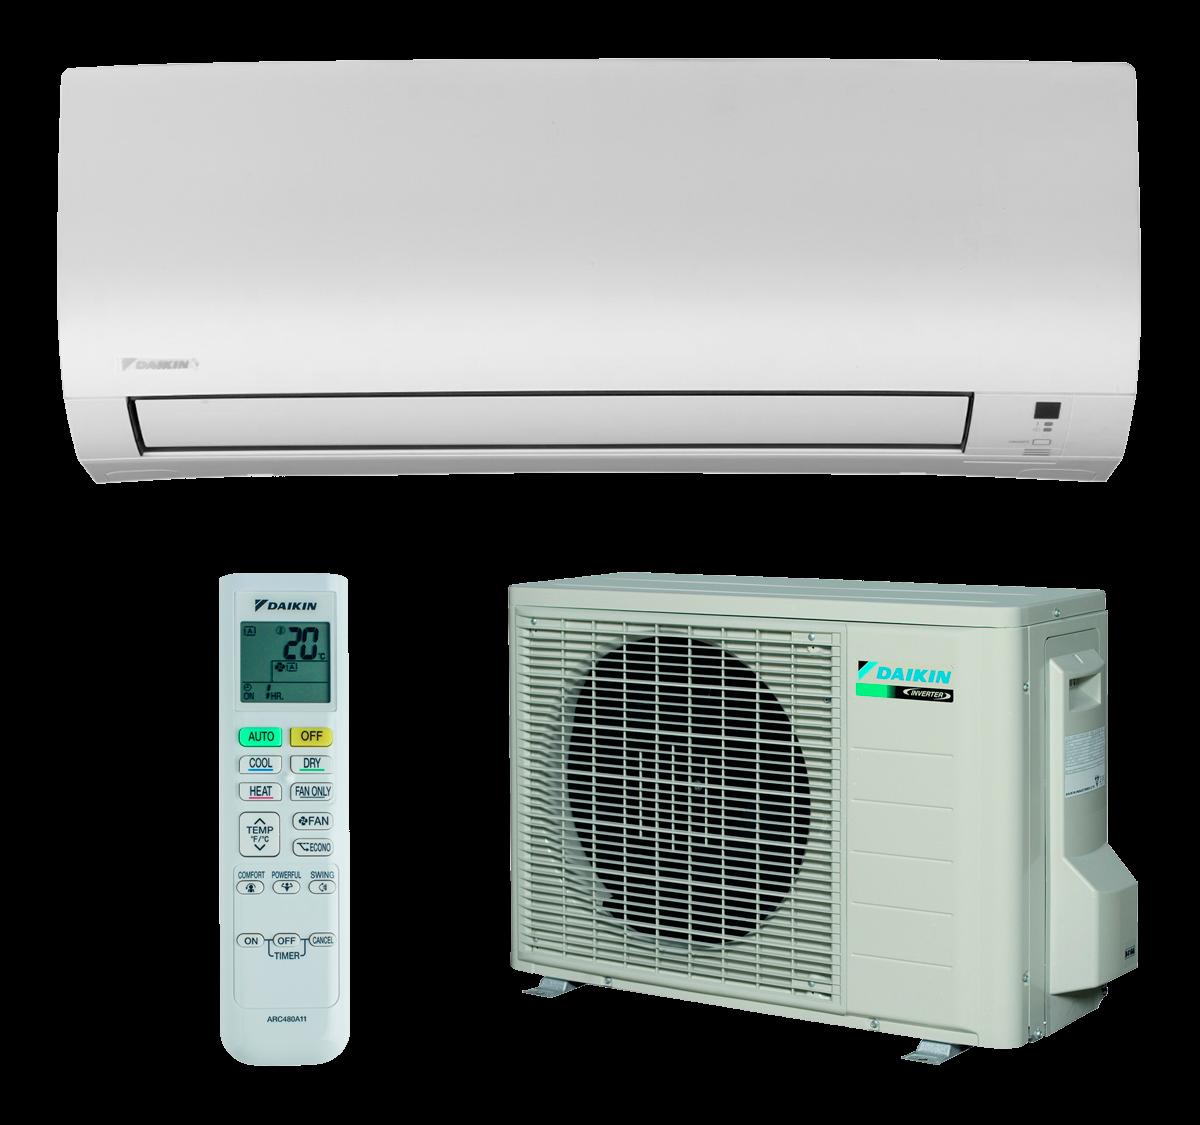 aire acondicionado conjunto split daikin inverter modelo comfora txp60m instalacion incluida caseragua 01